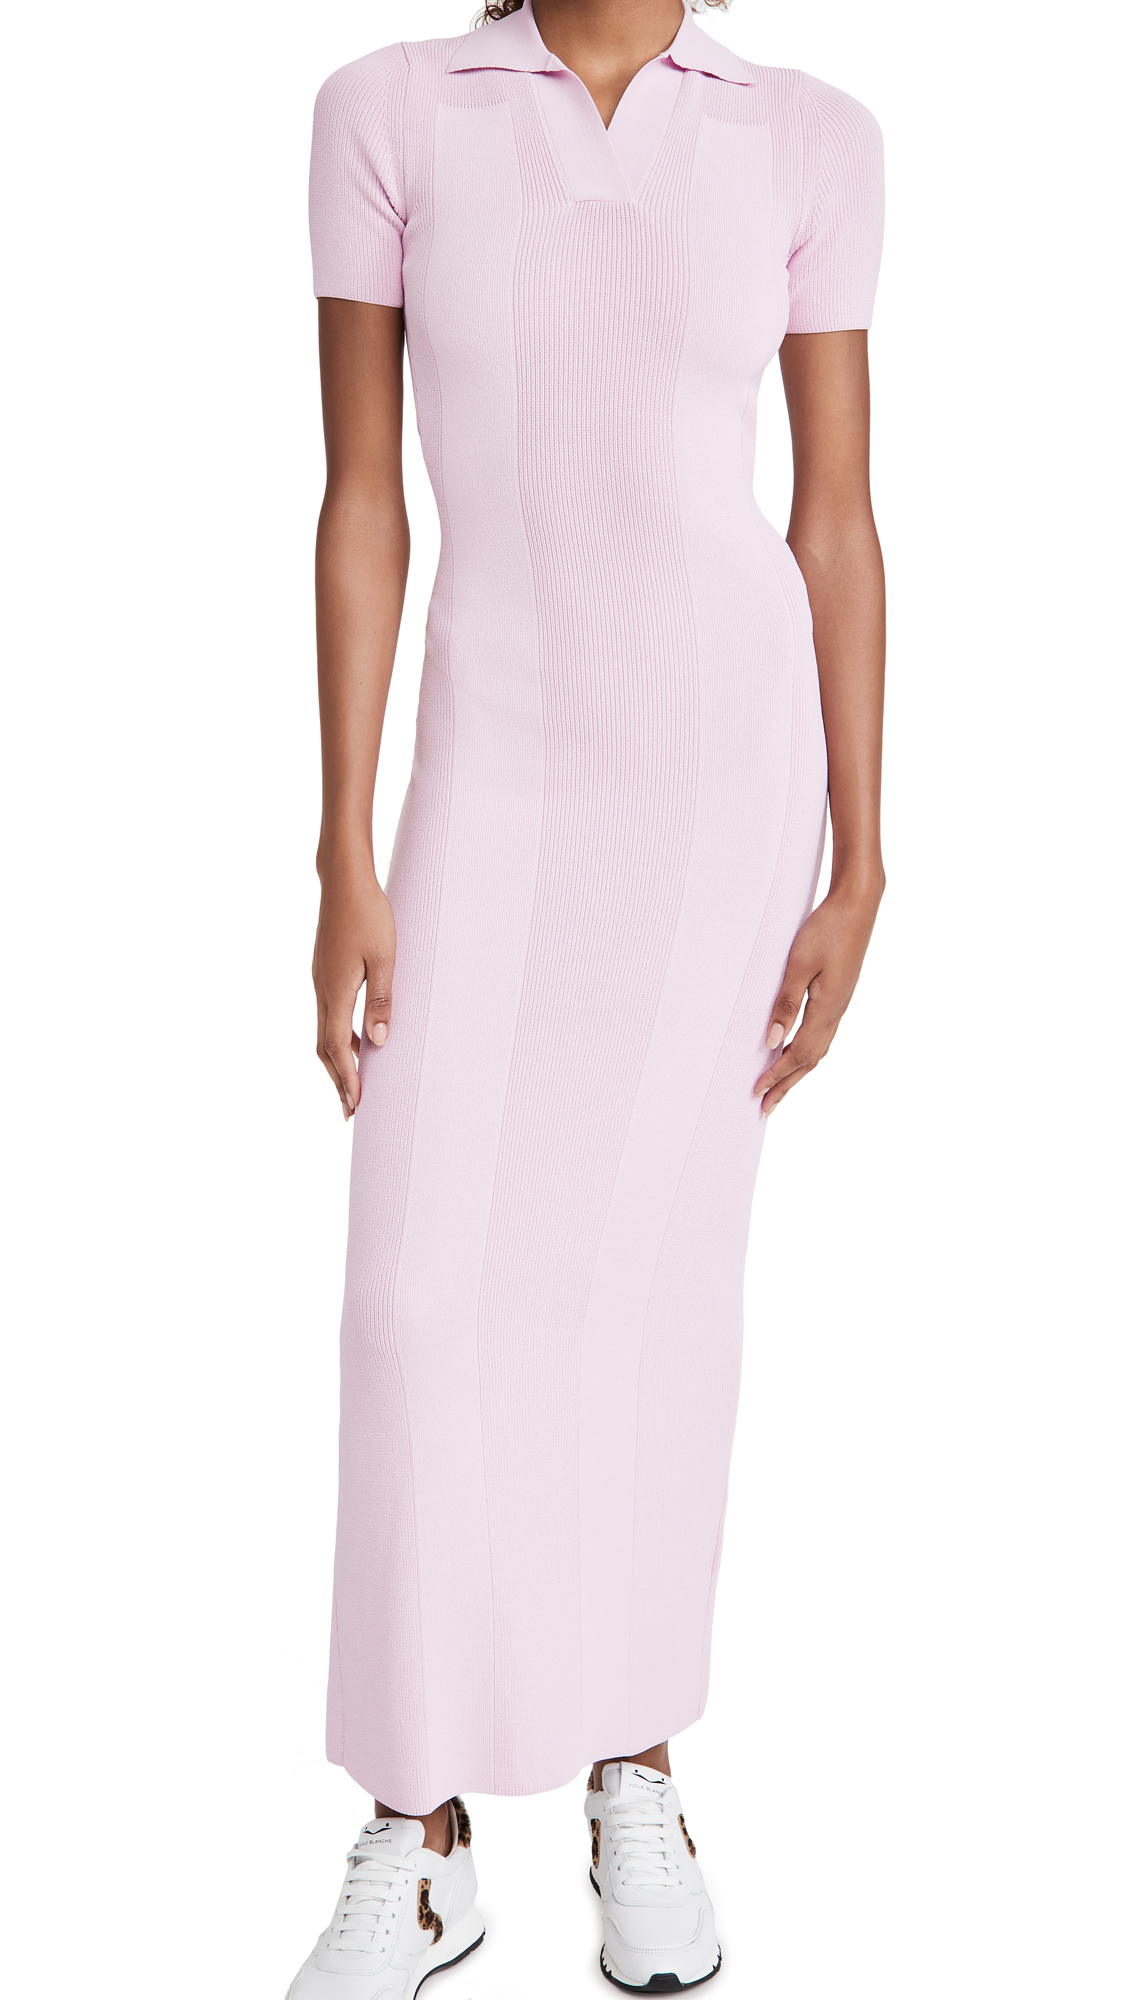 Jacquemus Polo Knit Dress